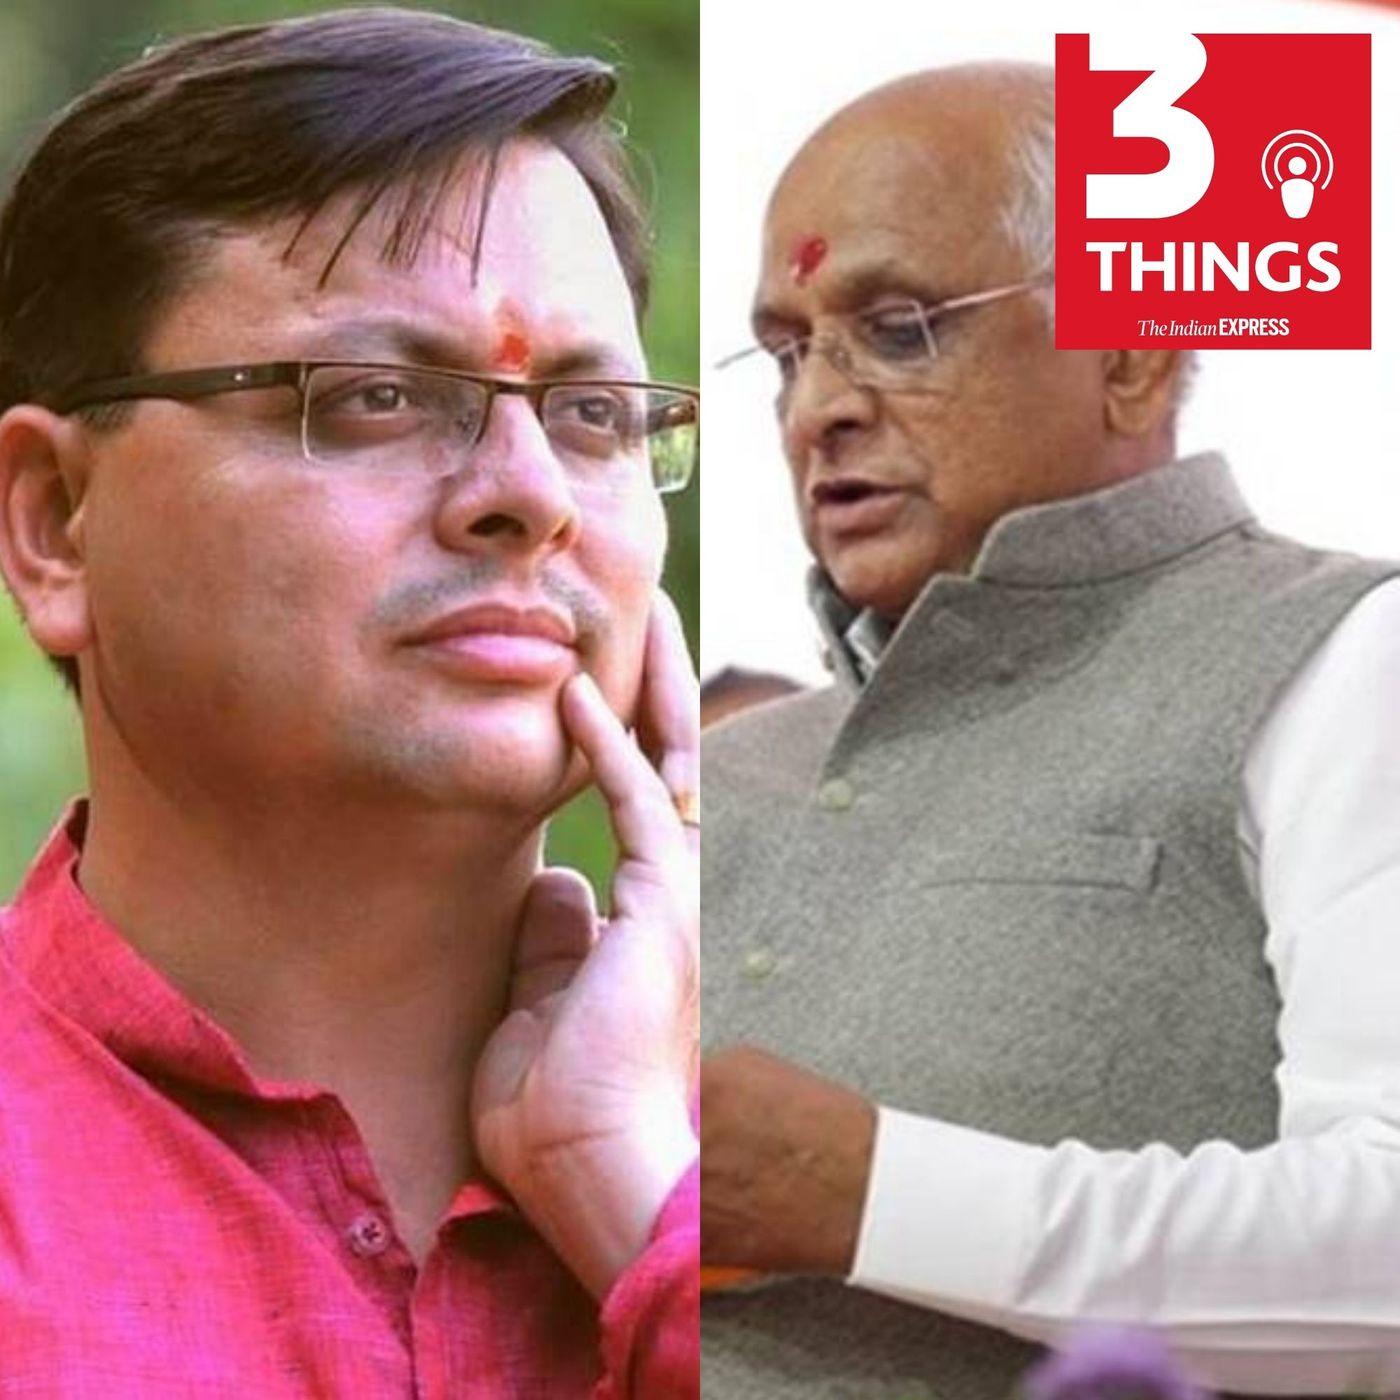 BJP's choice of CMs, 1 year since Hathras, and Neeraj Chopra's coach fired